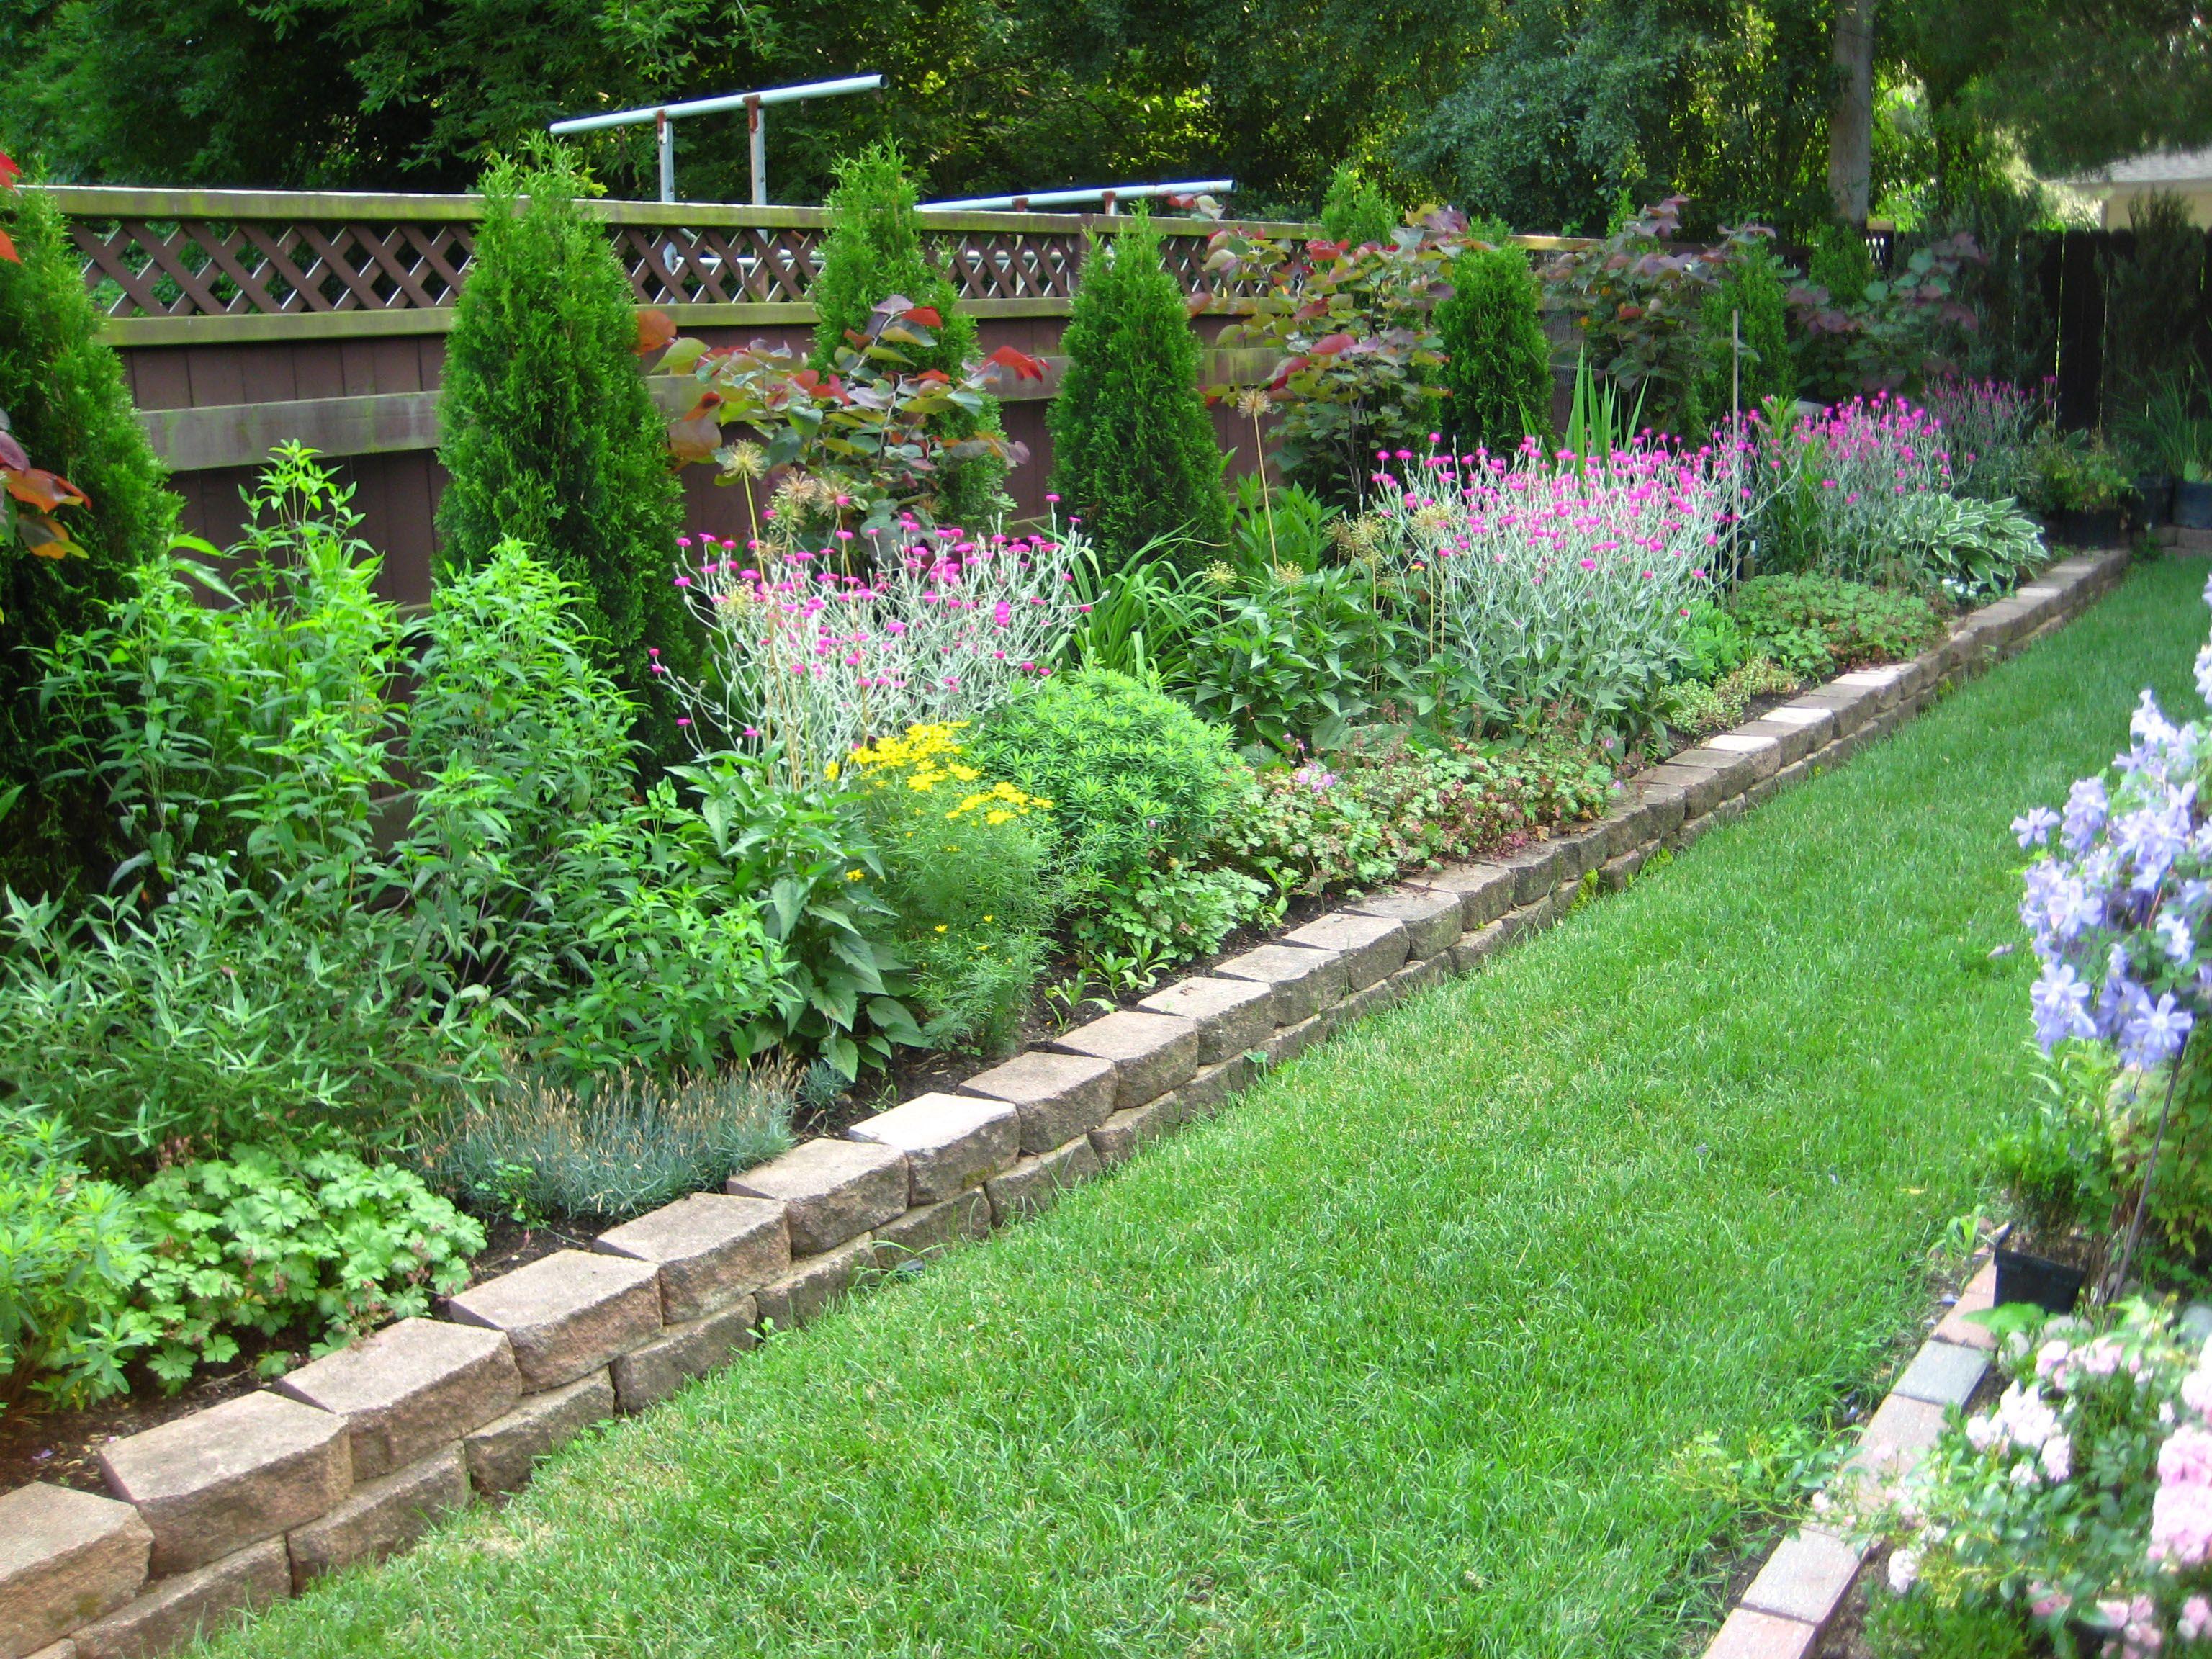 Small backyard garden design ideas - Admirable Minimalist Backyard Structural Garden Flower Bed With Straight Stone Lining And Little Pine Design Idea